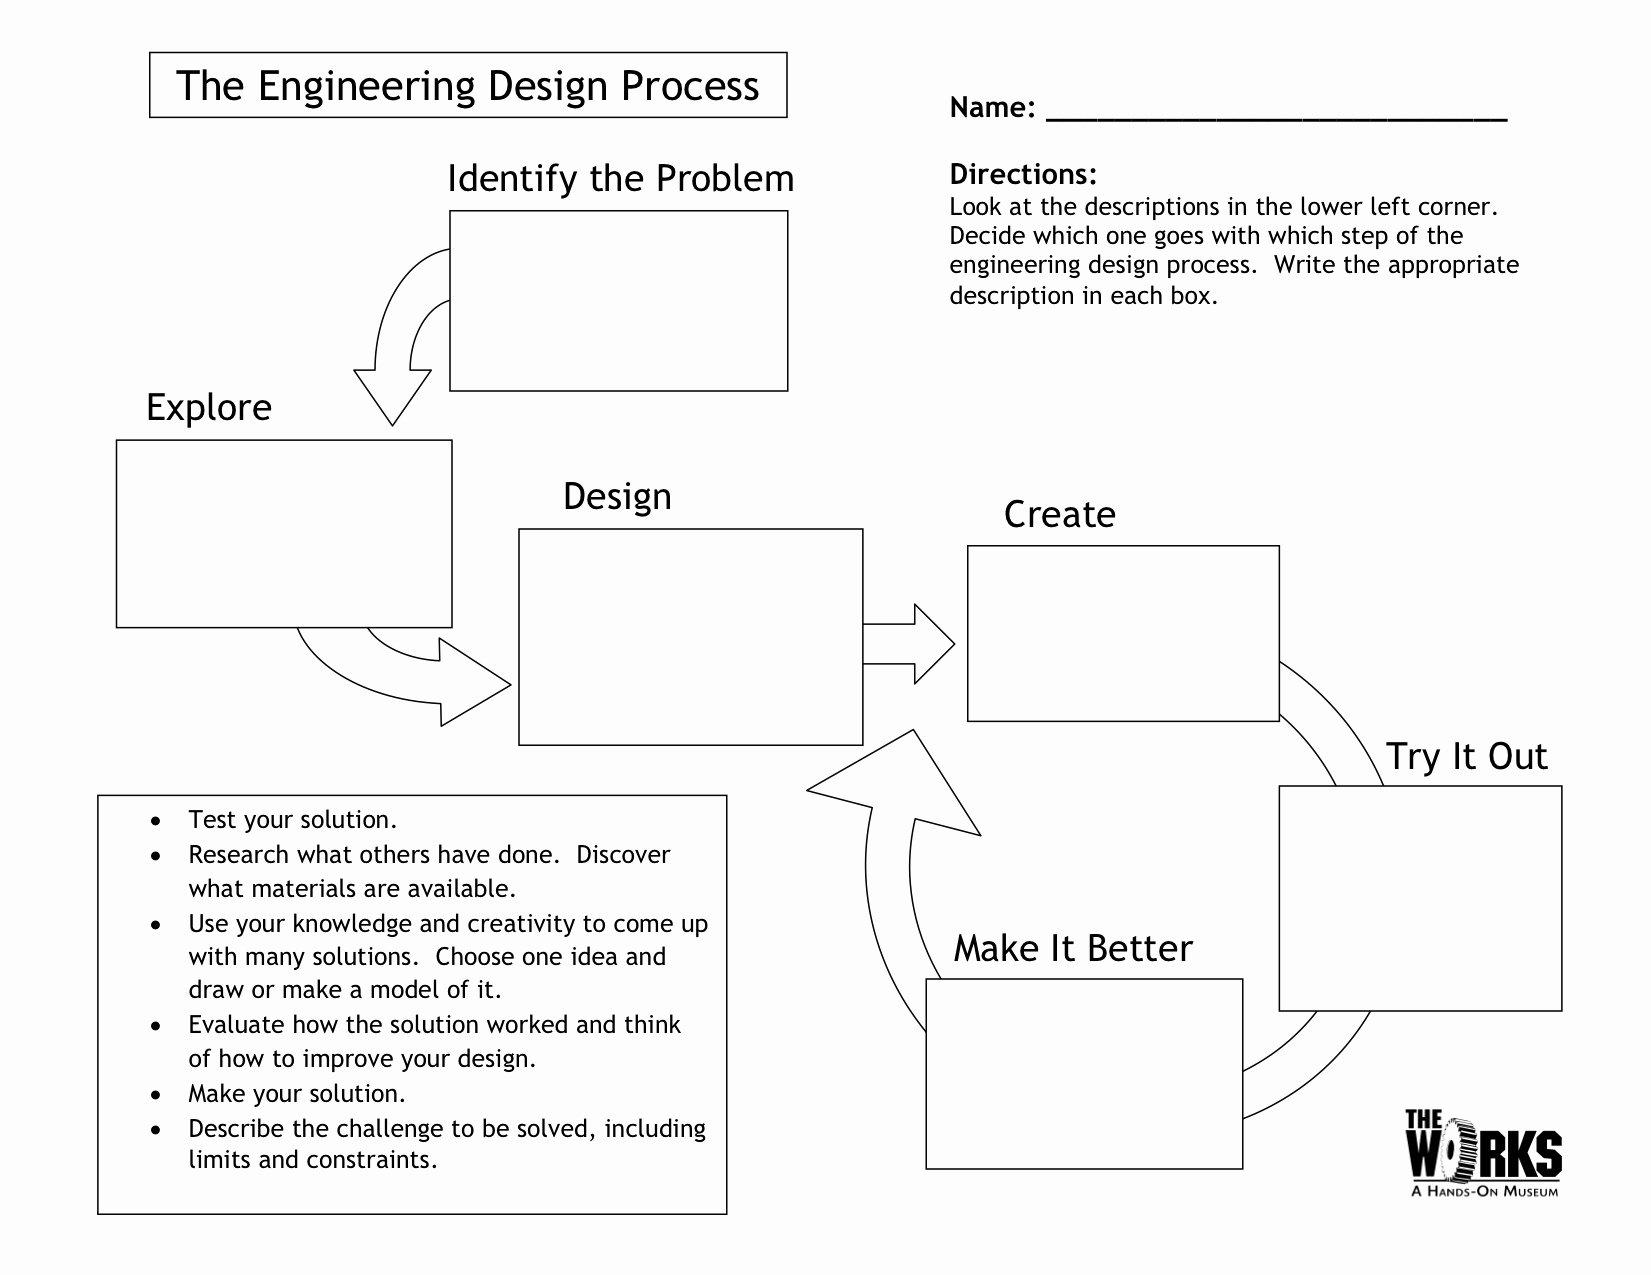 Engineering Design Process Worksheet New Egfi – for Teachers Lesson the Engineering Design Process